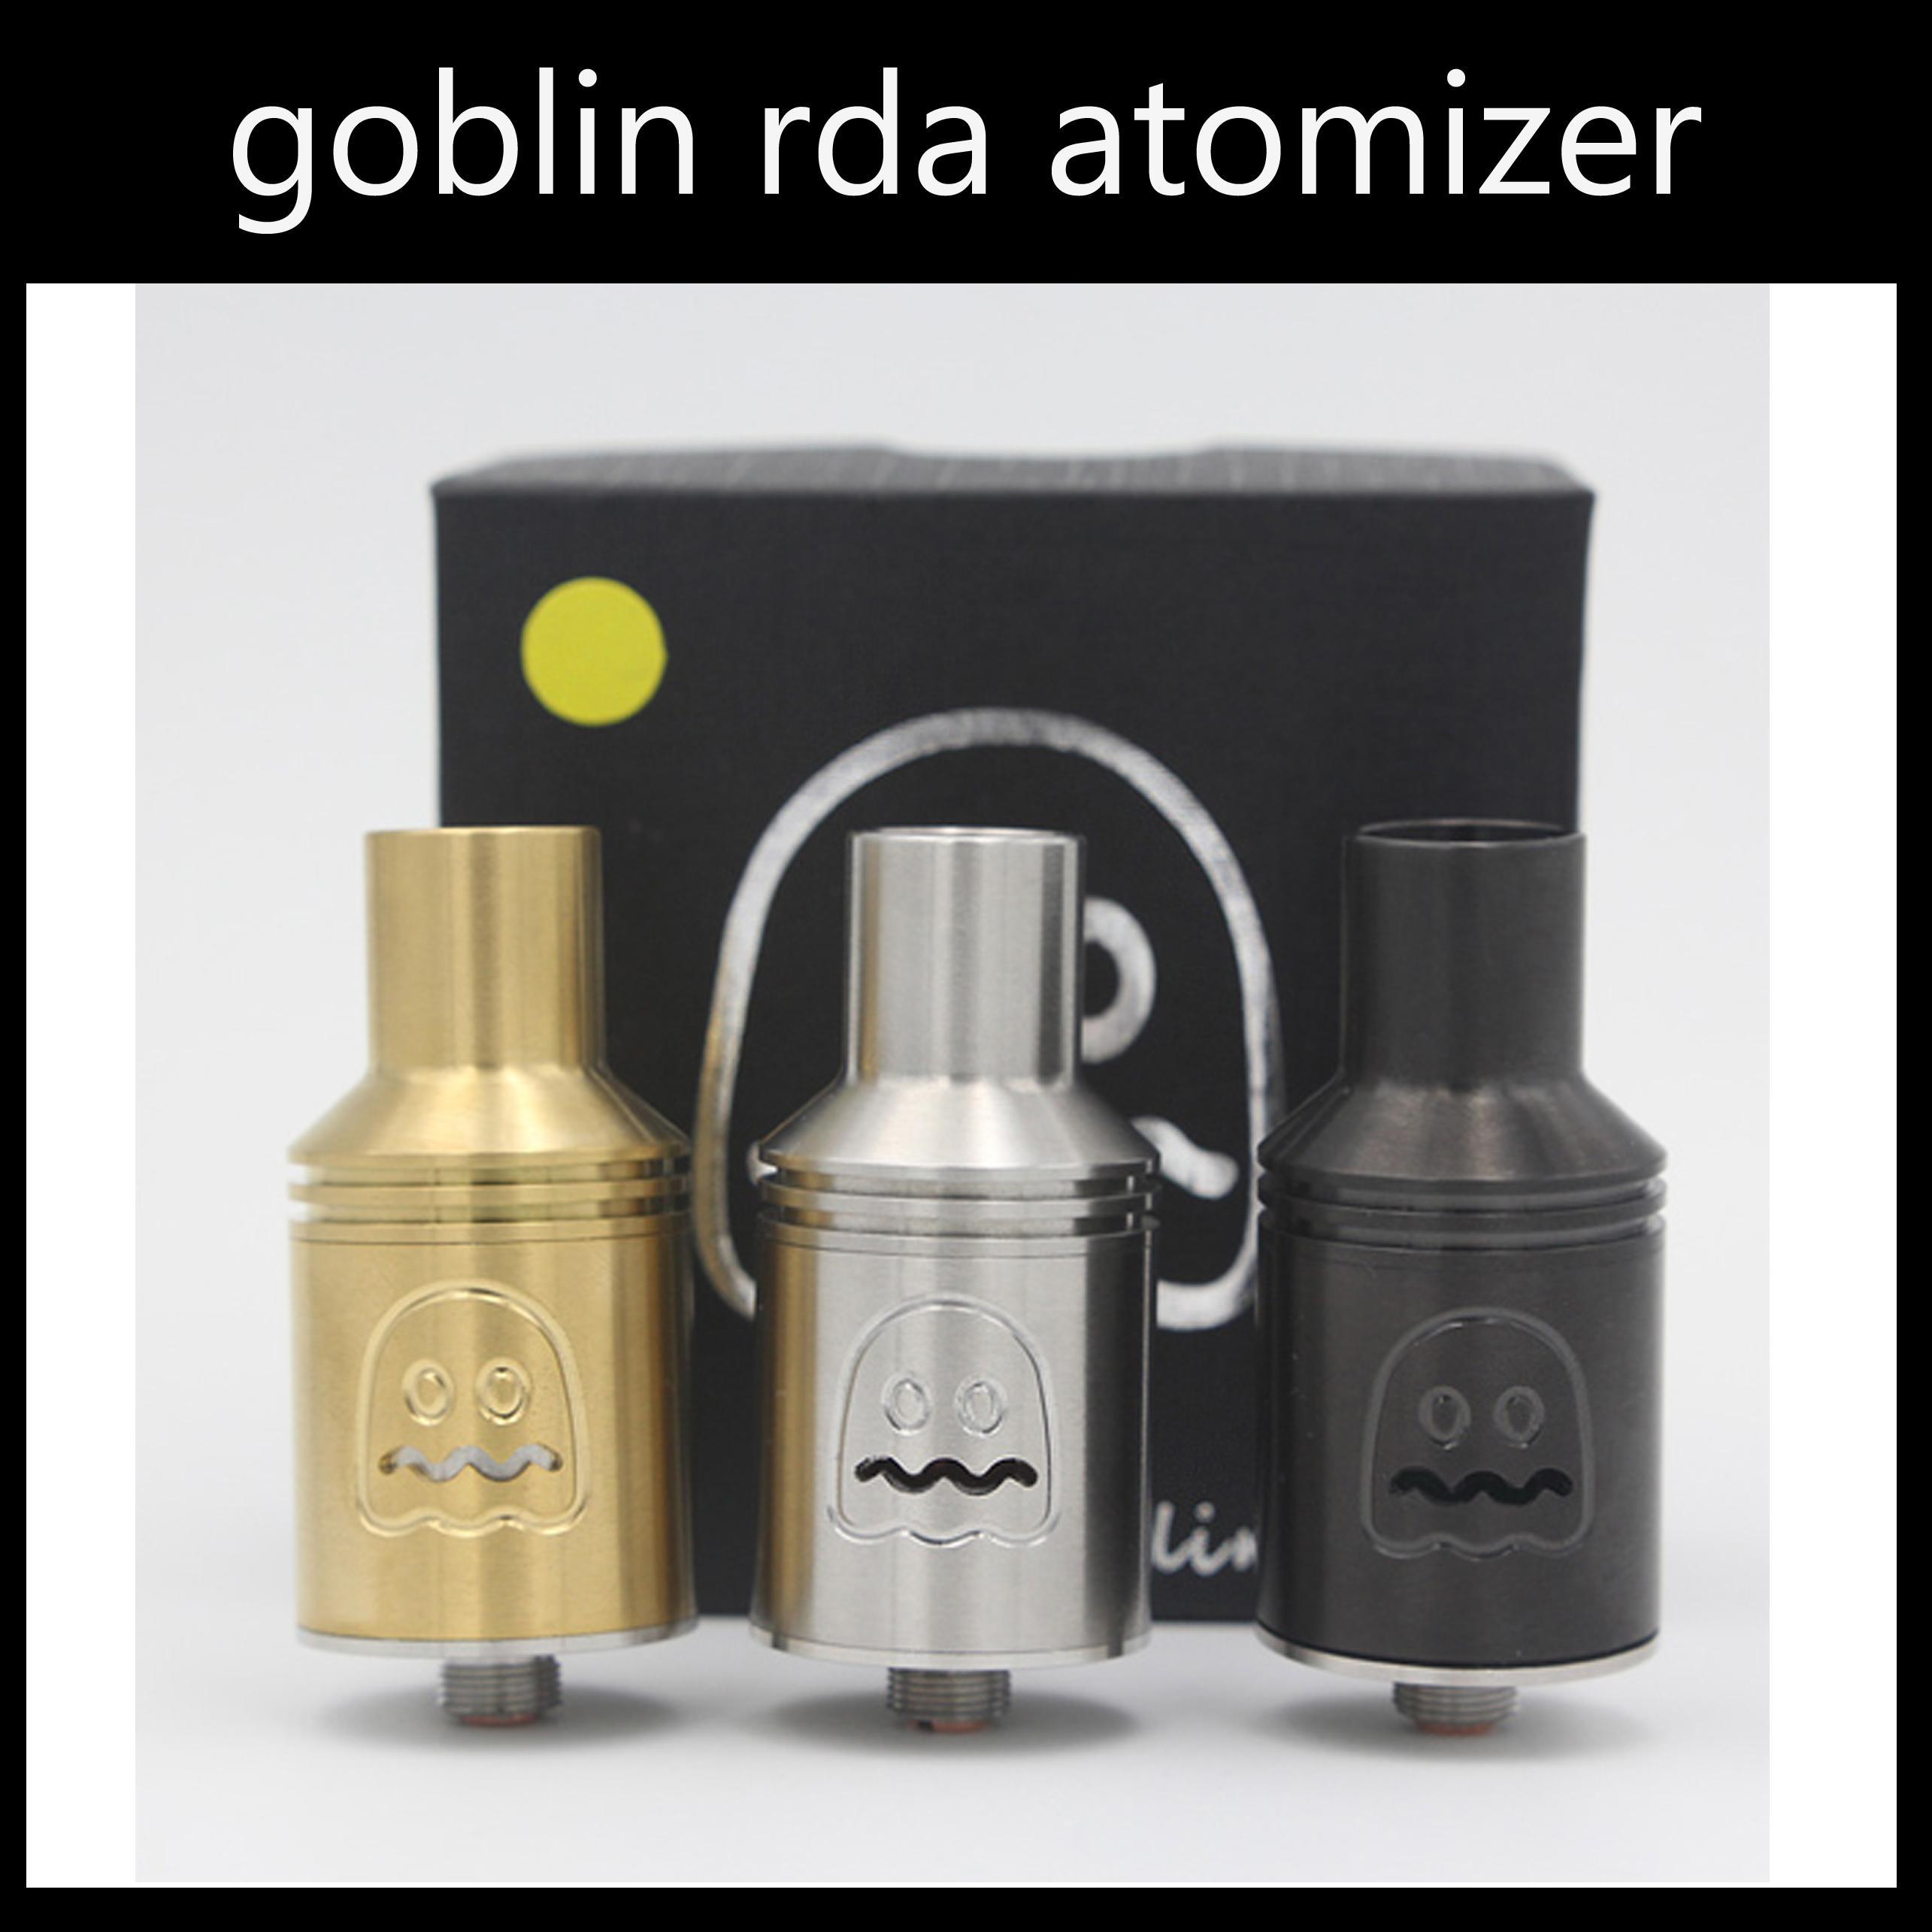 High Quality Rebuildable Goblin Atomizer 510 Thread 22mm Vaporizer E ...